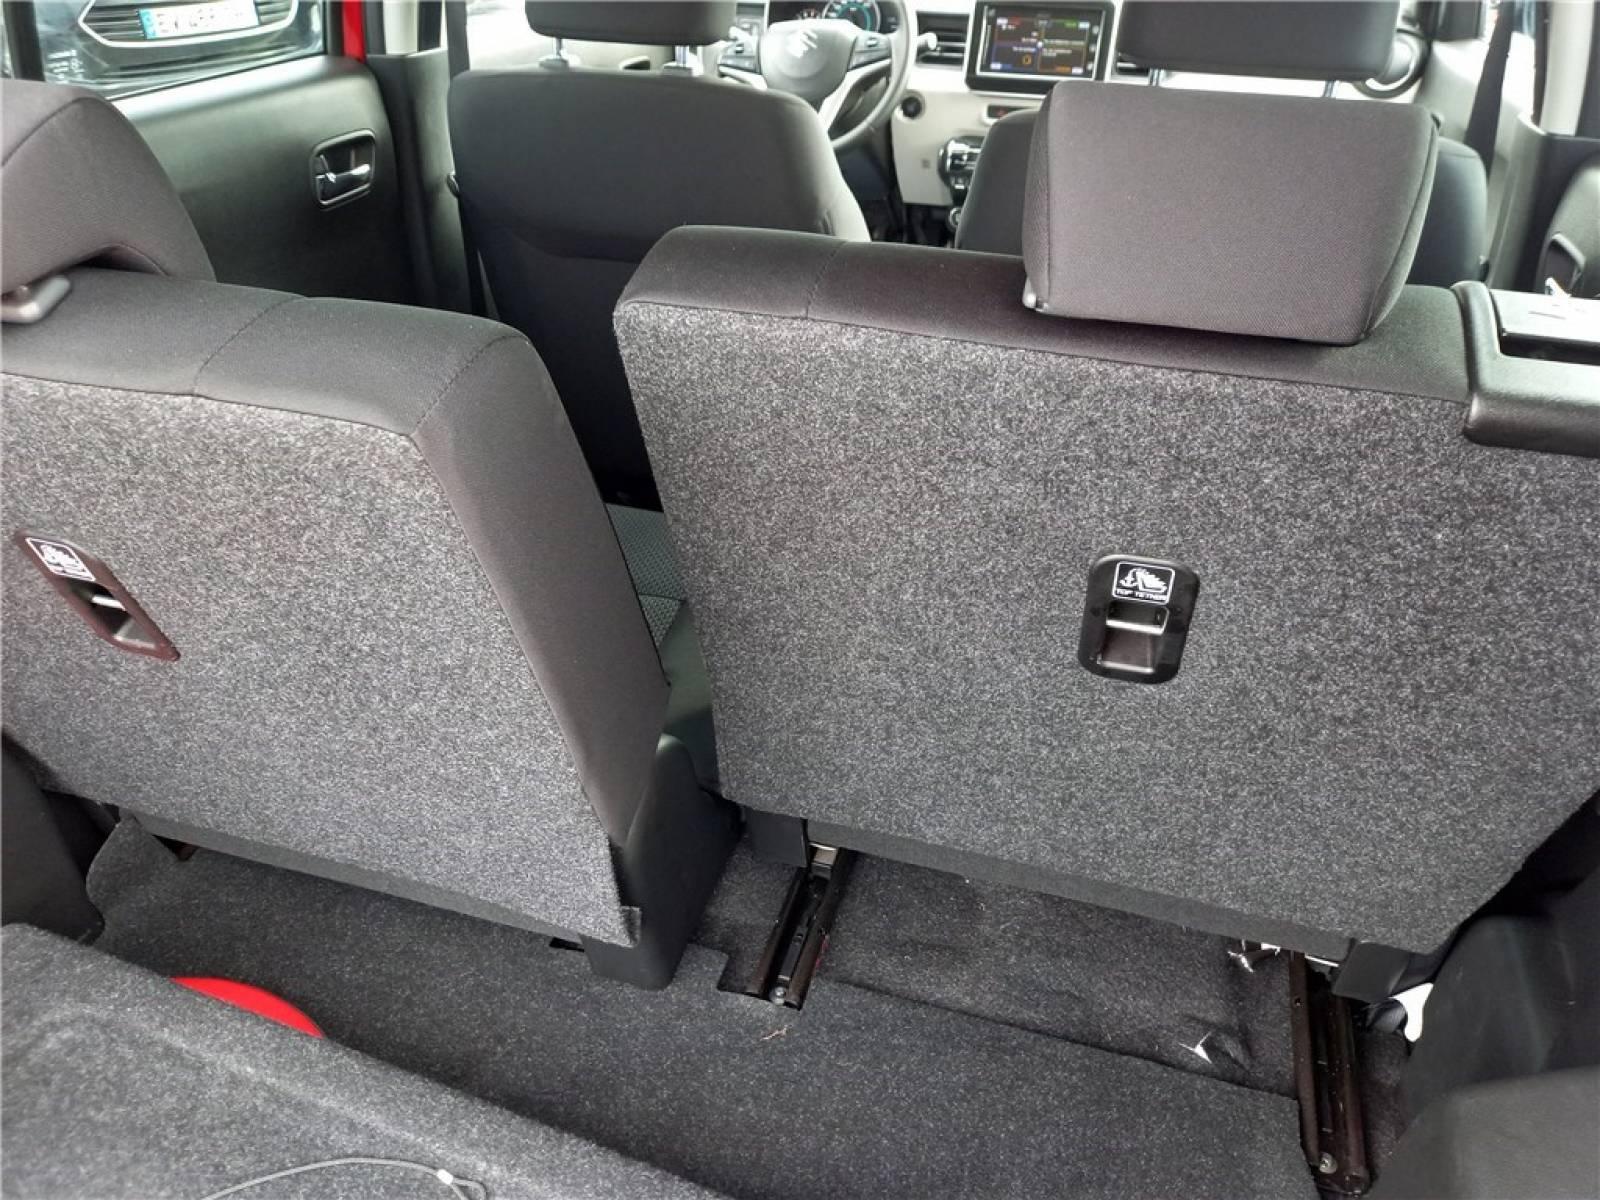 SUZUKI Ignis 1.2 Dualjet Auto (AGS) - véhicule d'occasion - Groupe Guillet - Opel Magicauto - Chalon-sur-Saône - 71380 - Saint-Marcel - 11